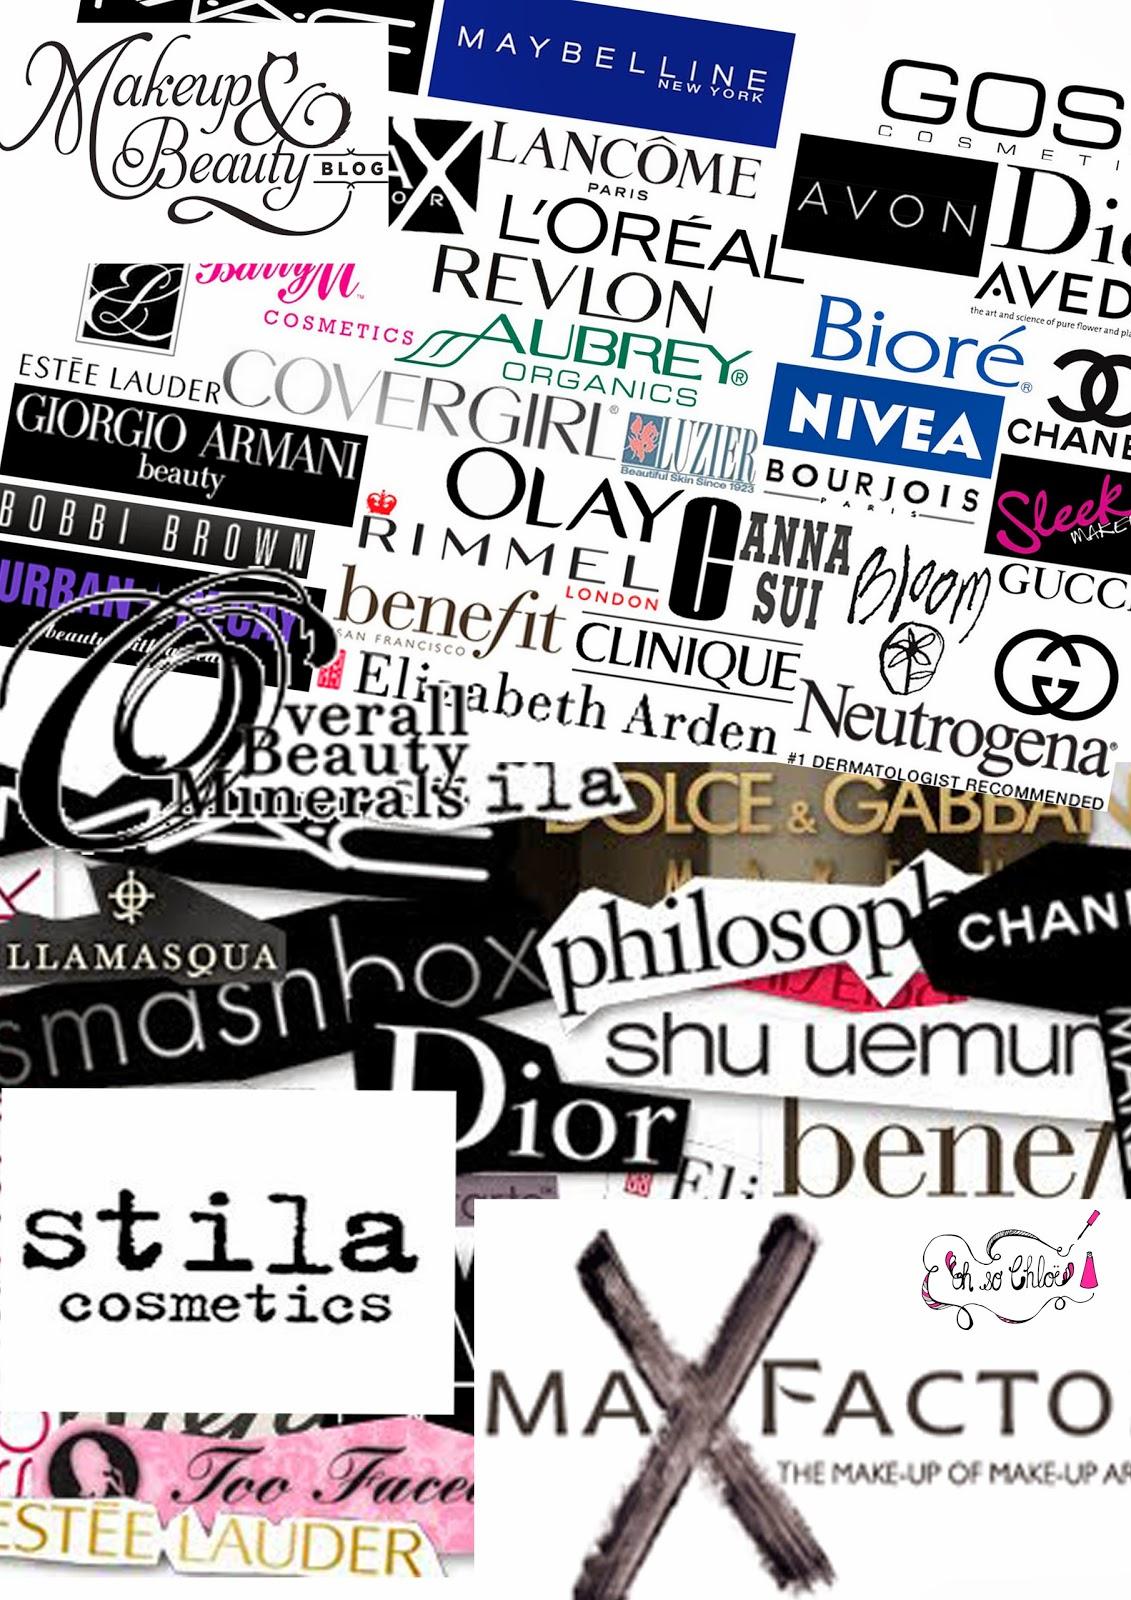 Top 16 Makeup Brands and Their Company Logos ...  Leading Makeup Brand Logo